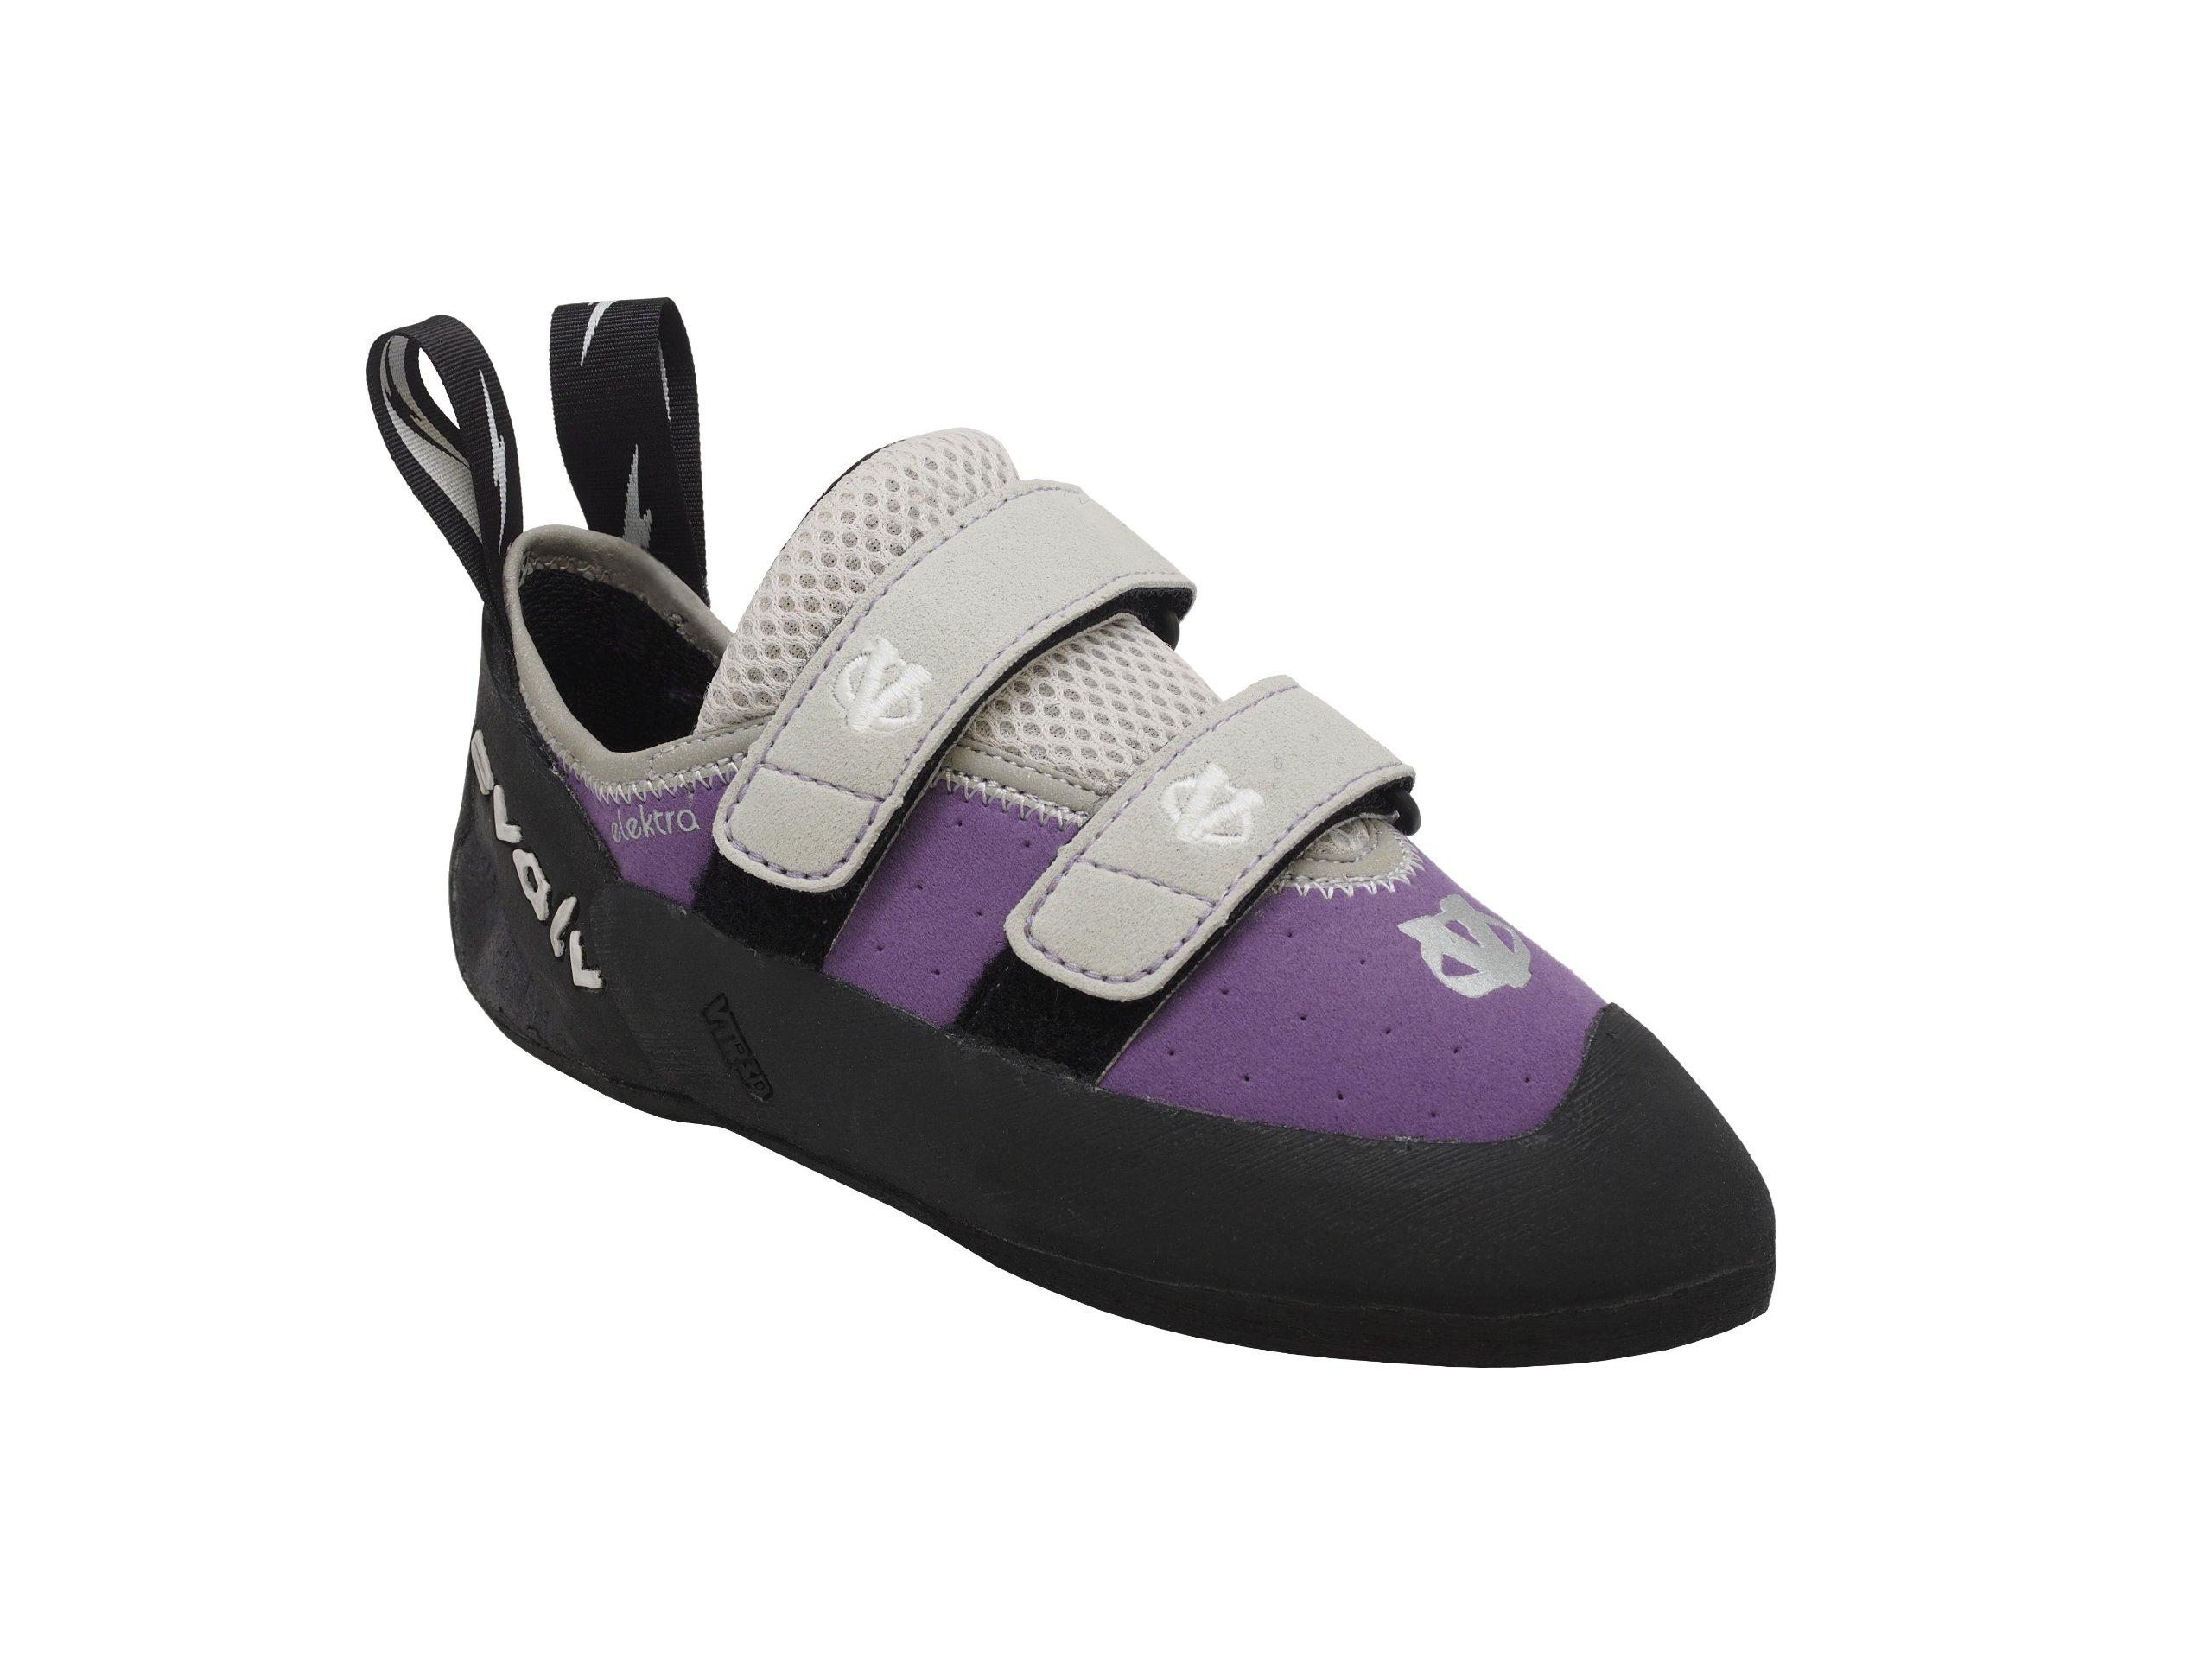 Evolv Elektra Climbing Shoe (2014) - Women's Violet 8.5